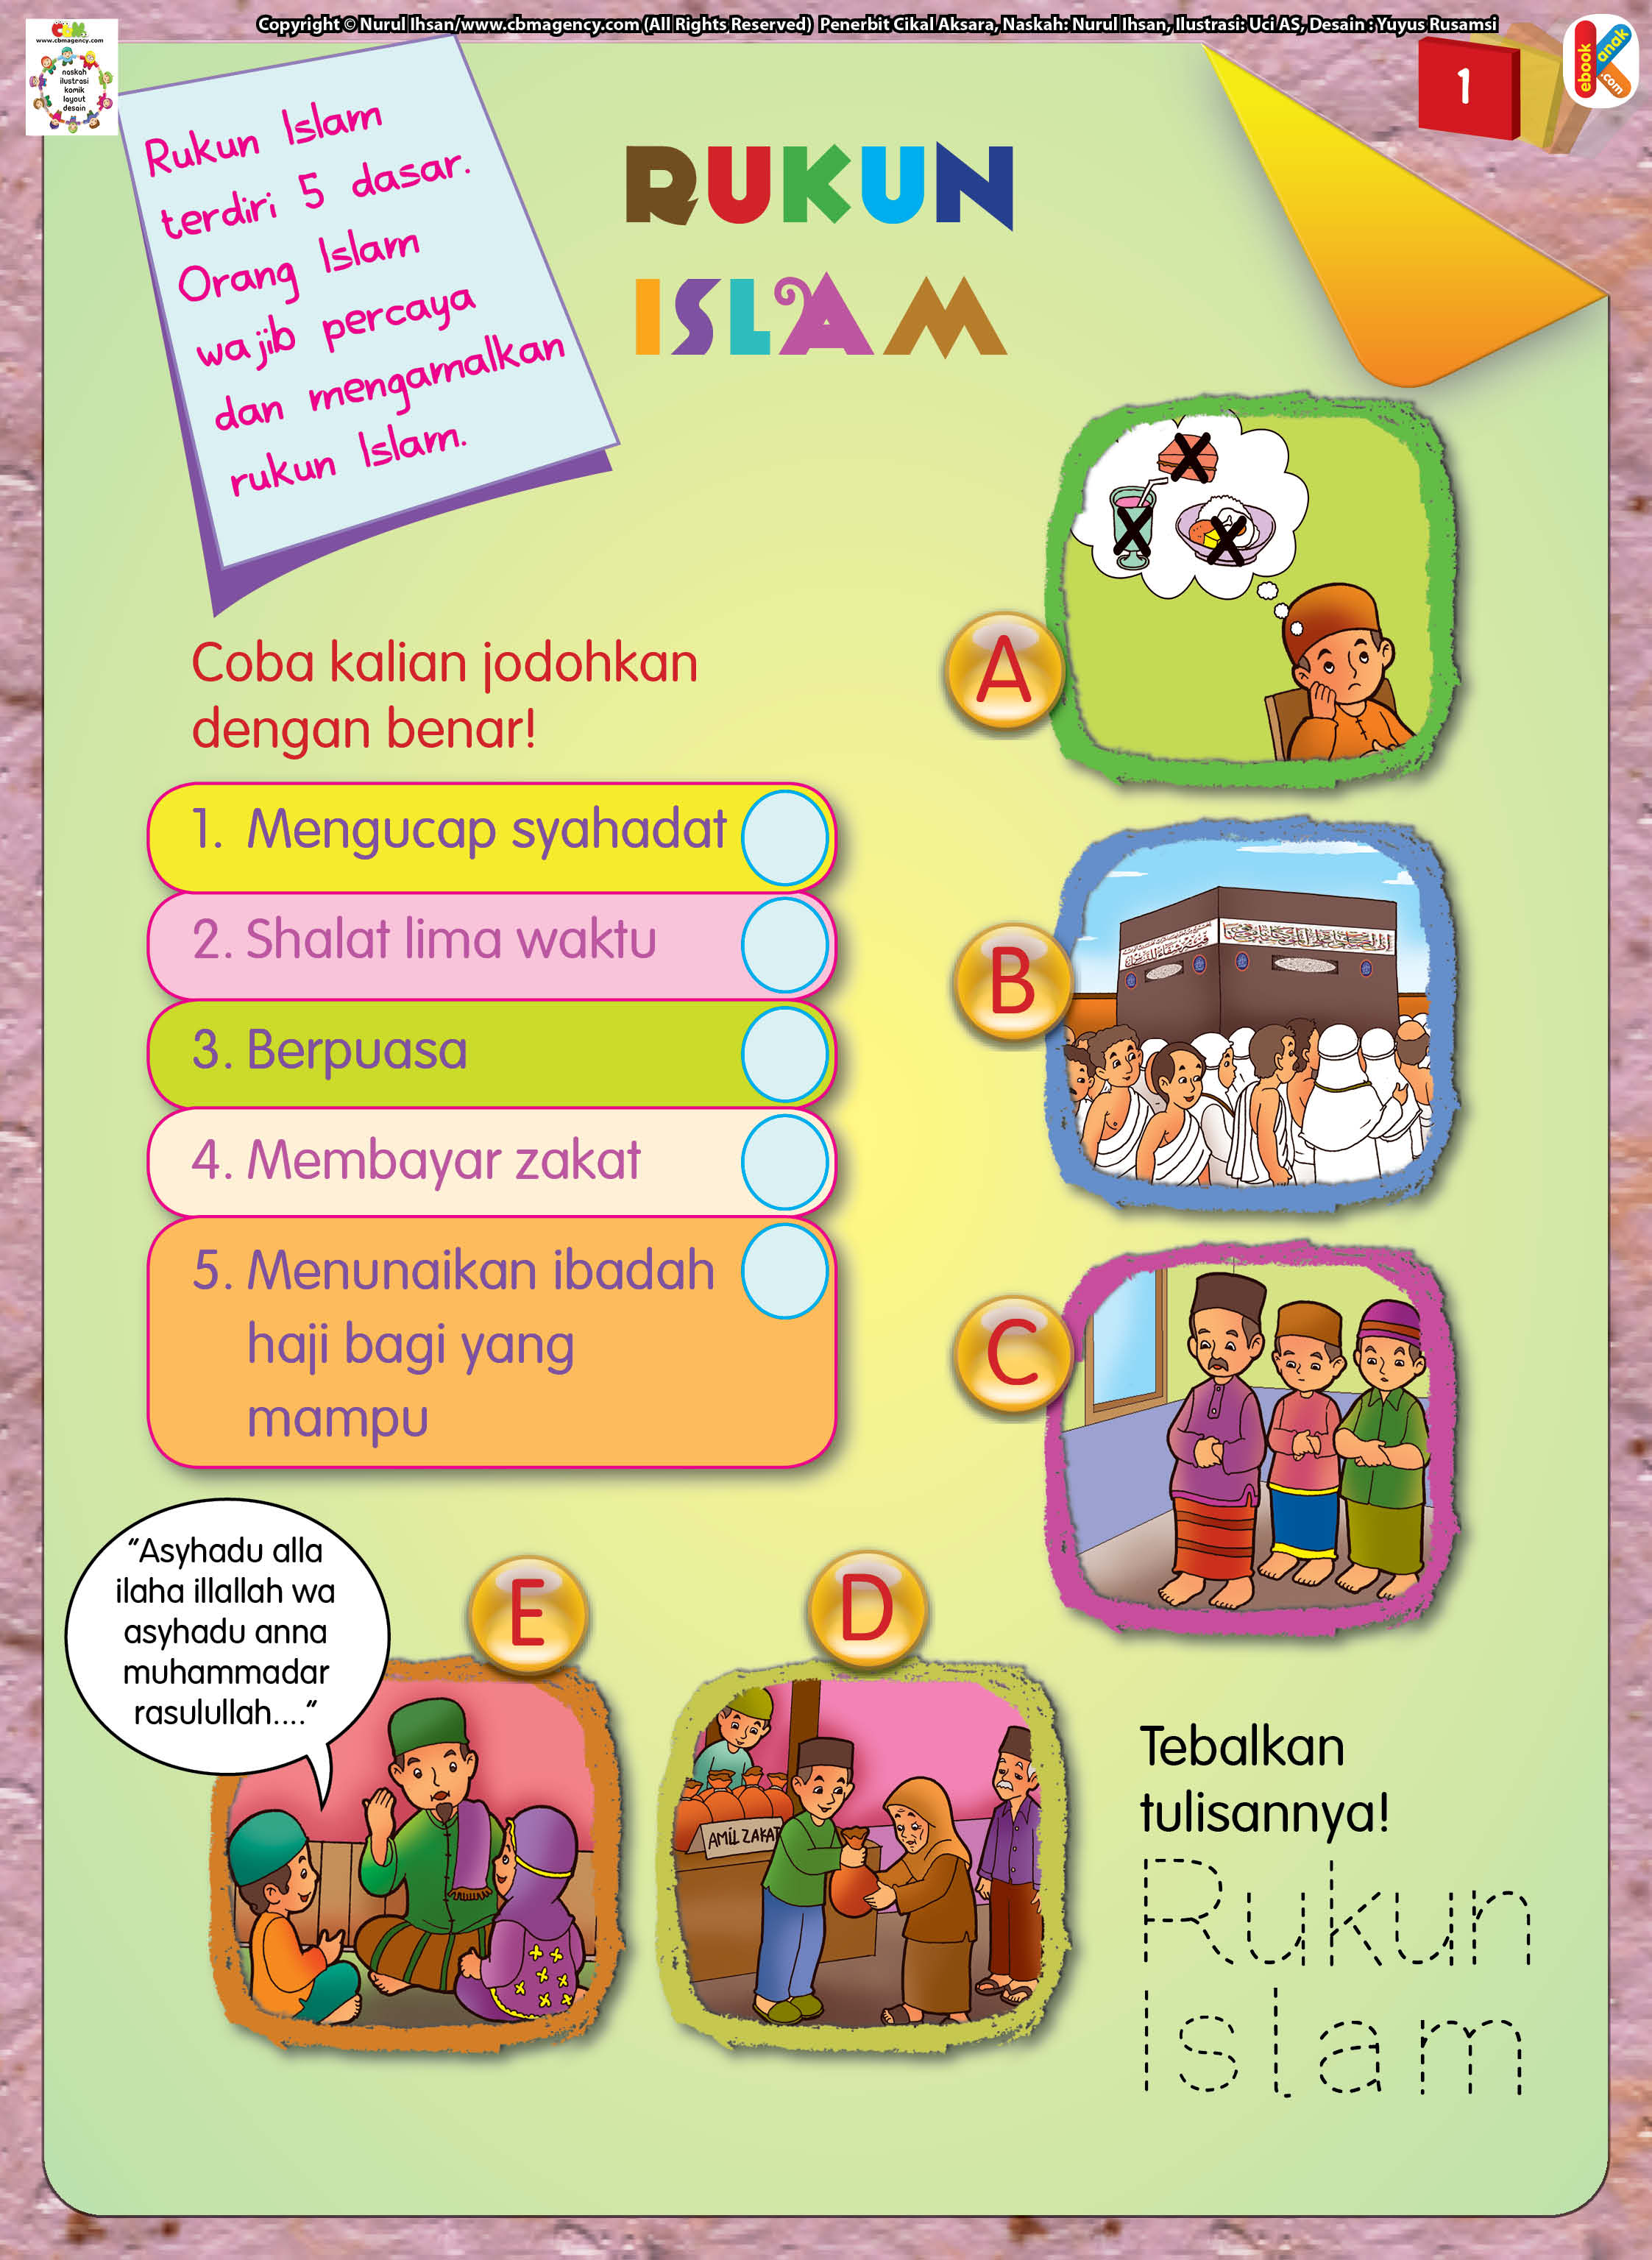 mengenal worksheets rukun islam untuk anak TK dan PAUD.